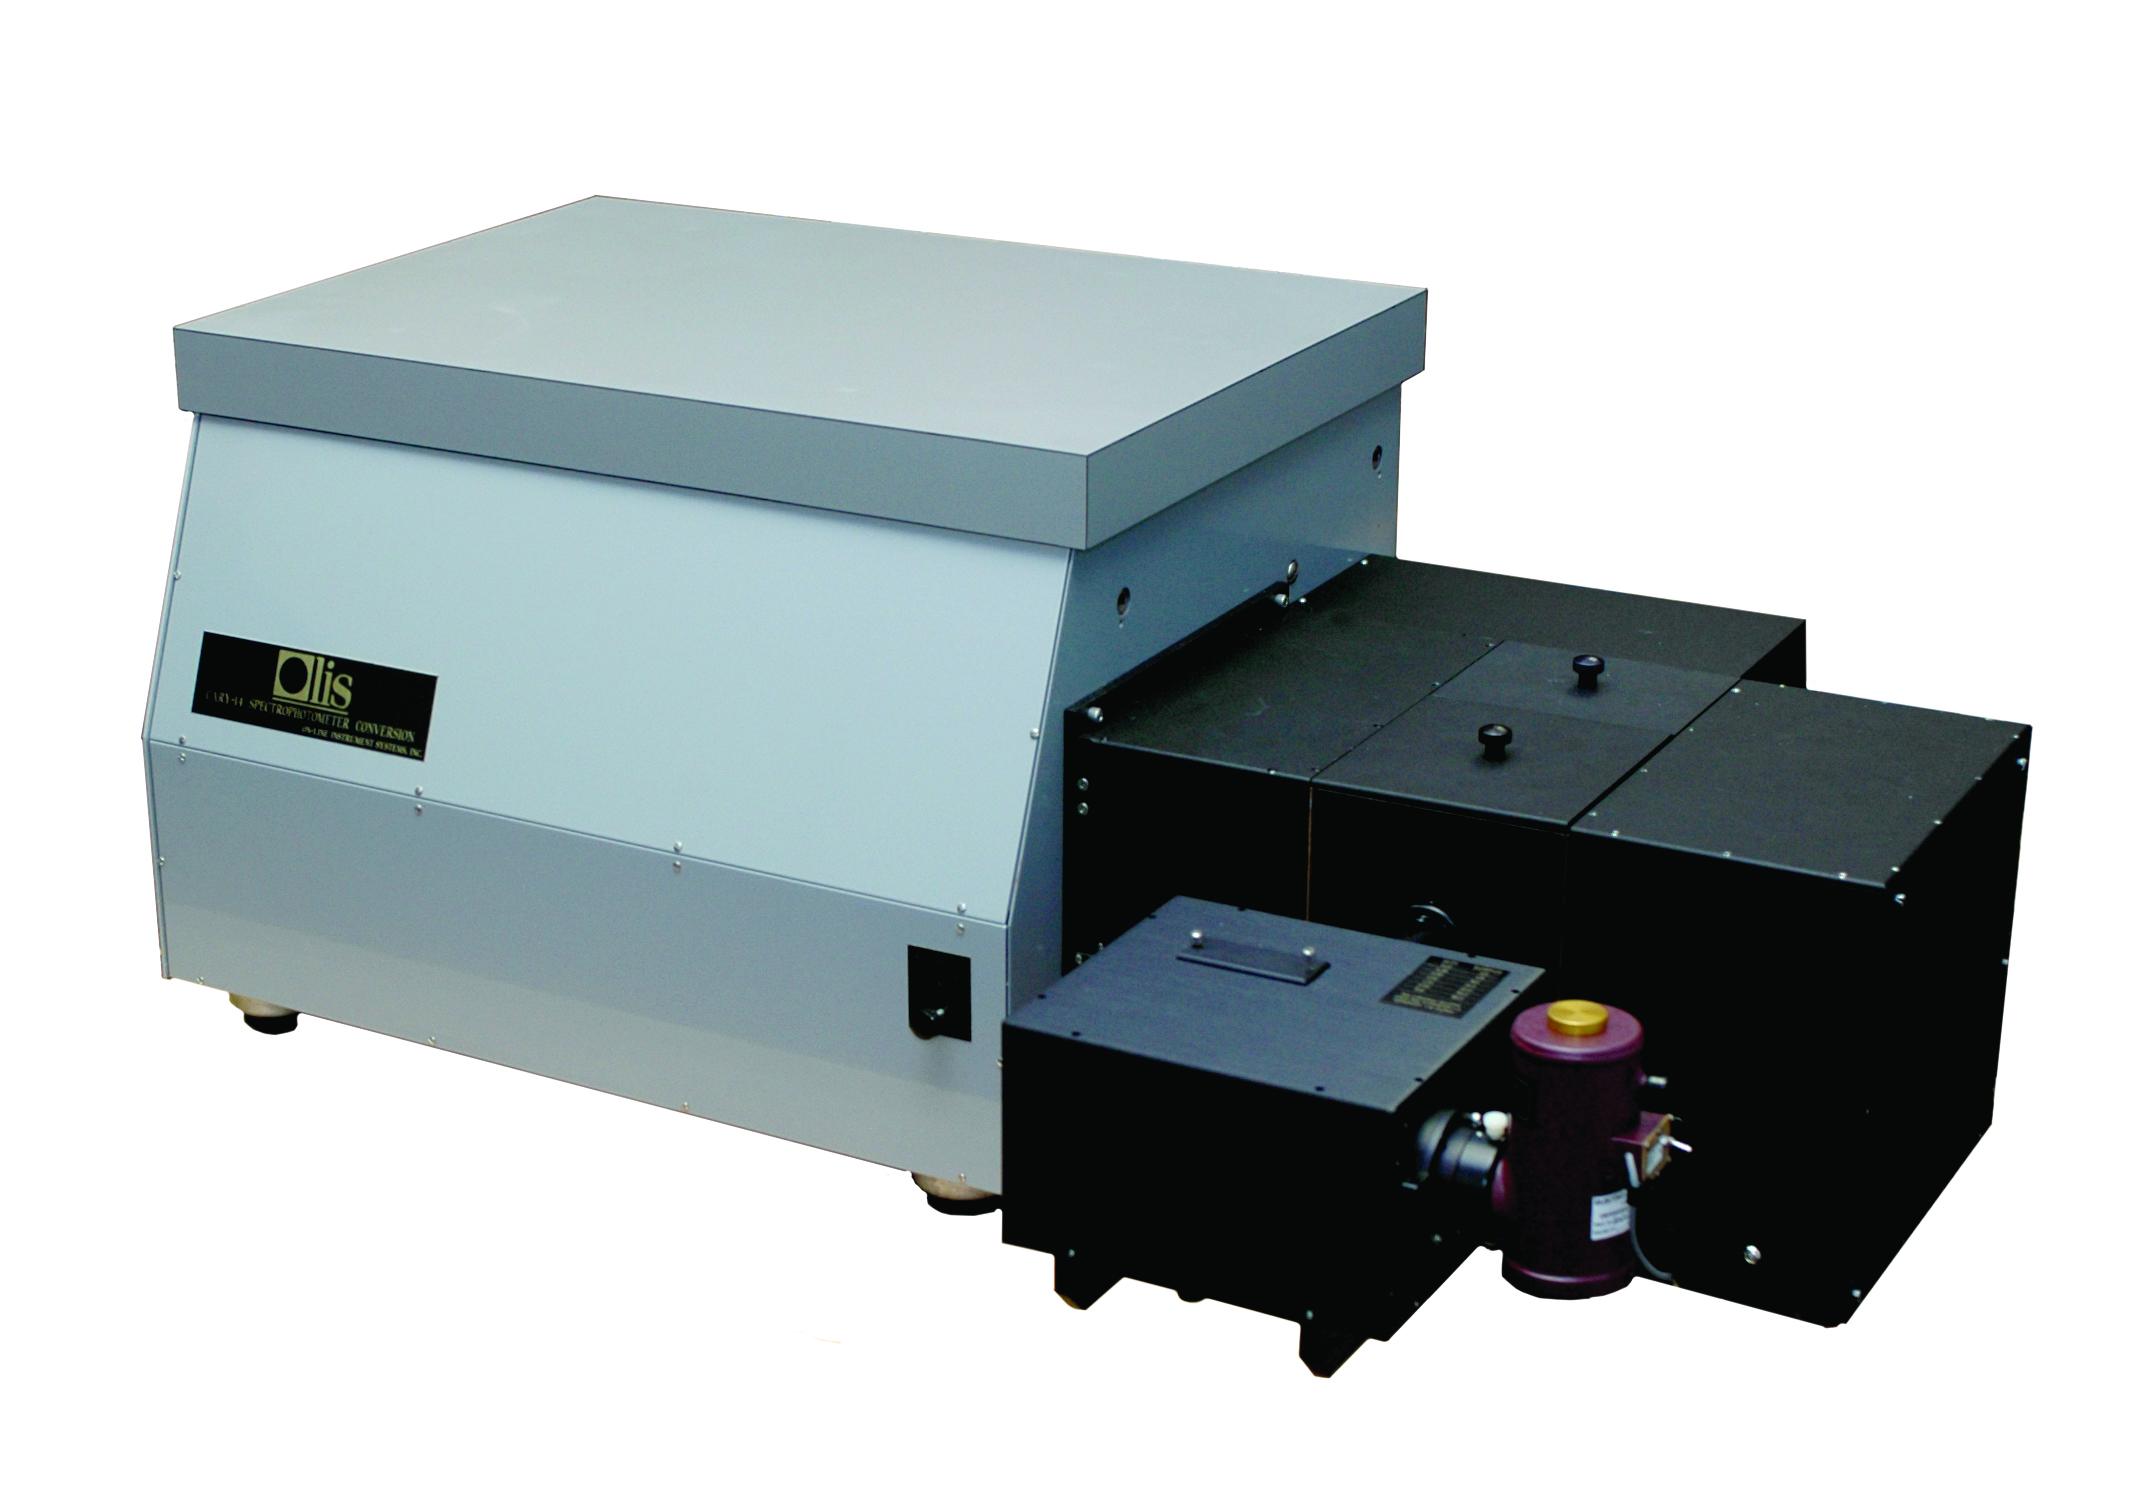 OLIS 14F UV/Vis/NIR Spectrophotometer